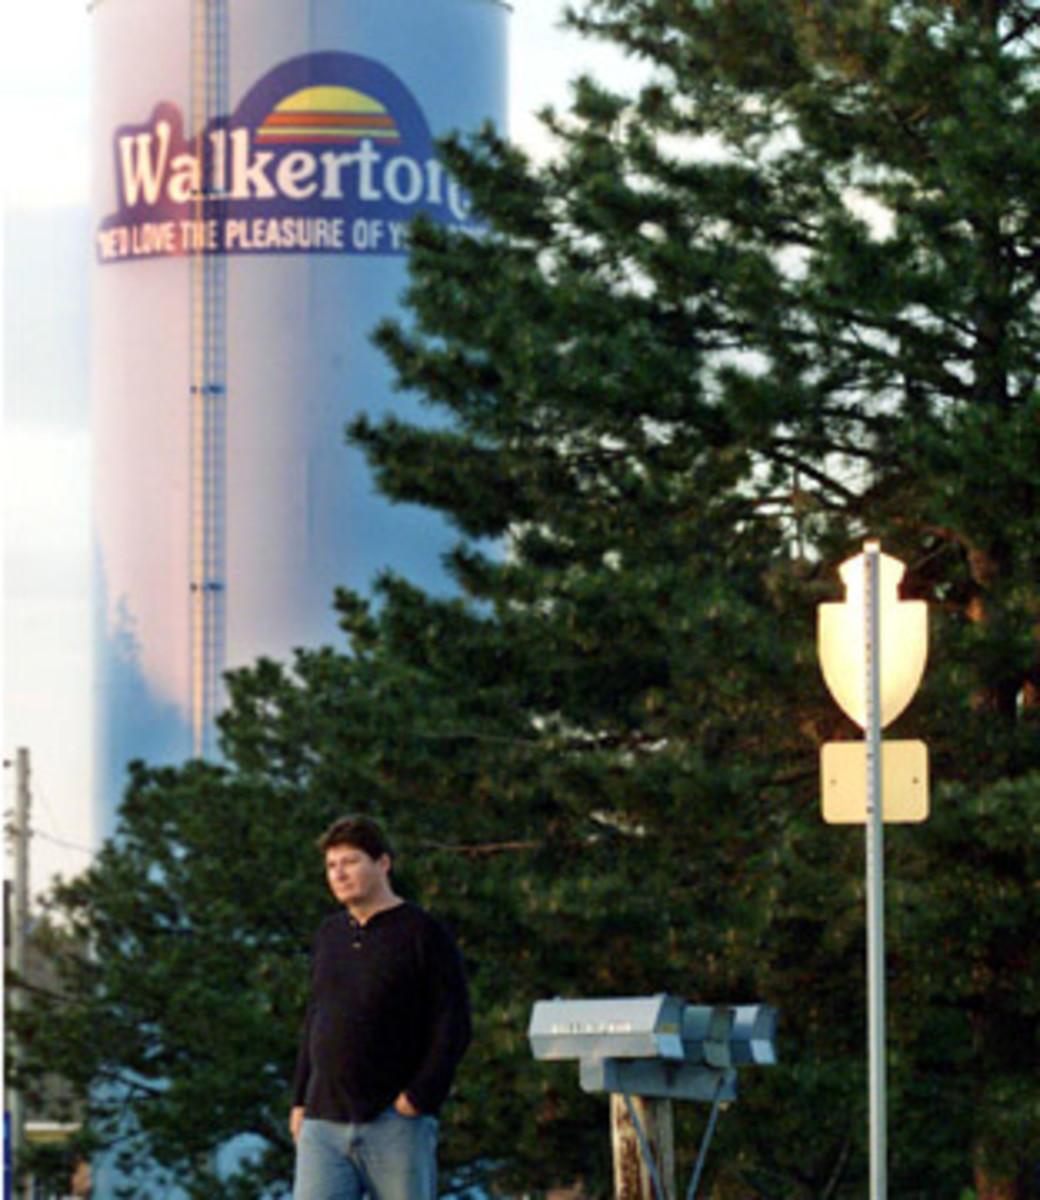 Walkerton's water tower